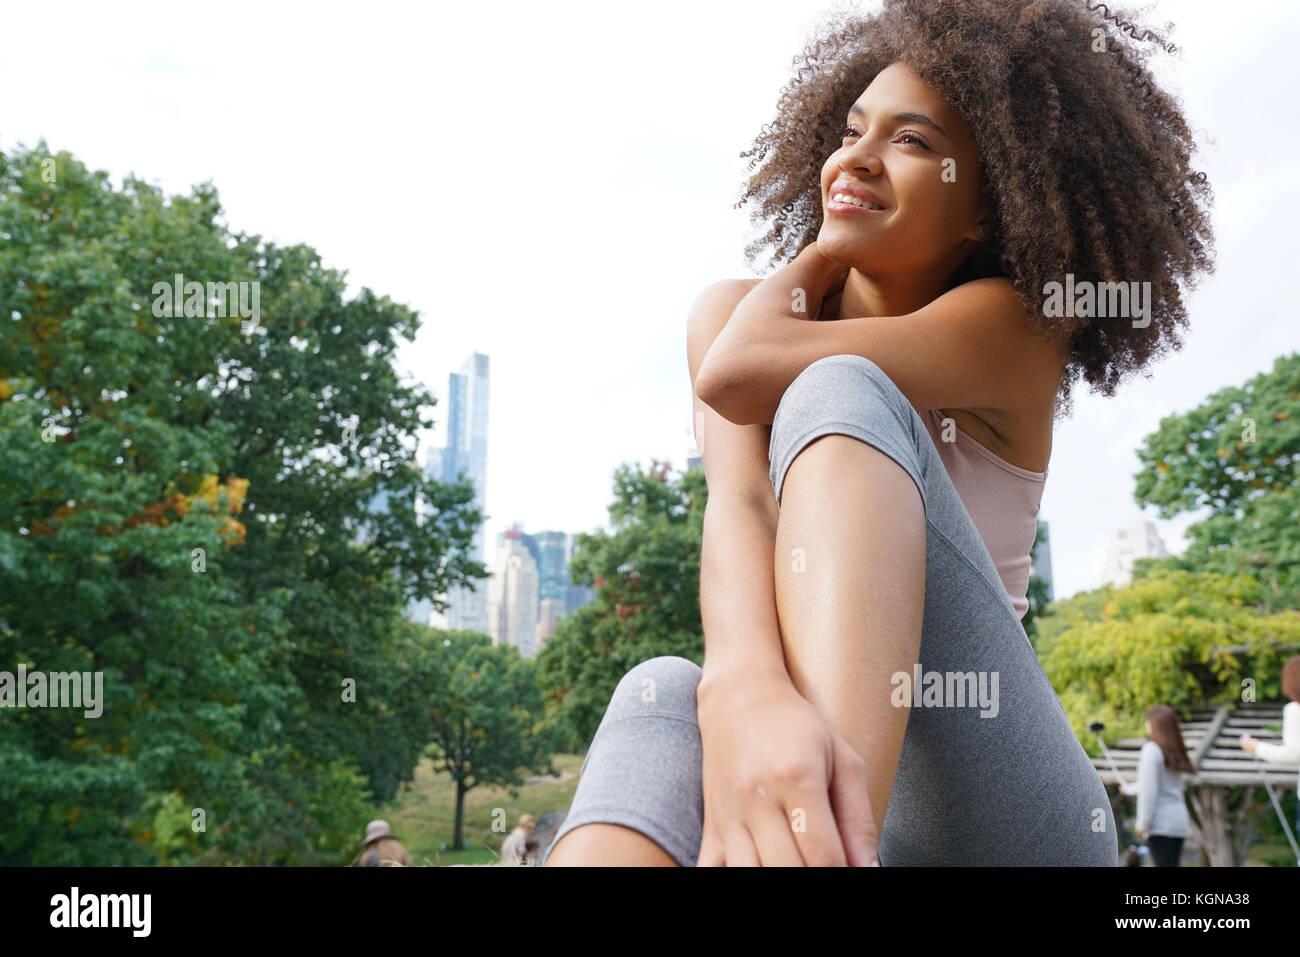 Schöne Frau tun Entspannungsübungen am Central Park Stockbild